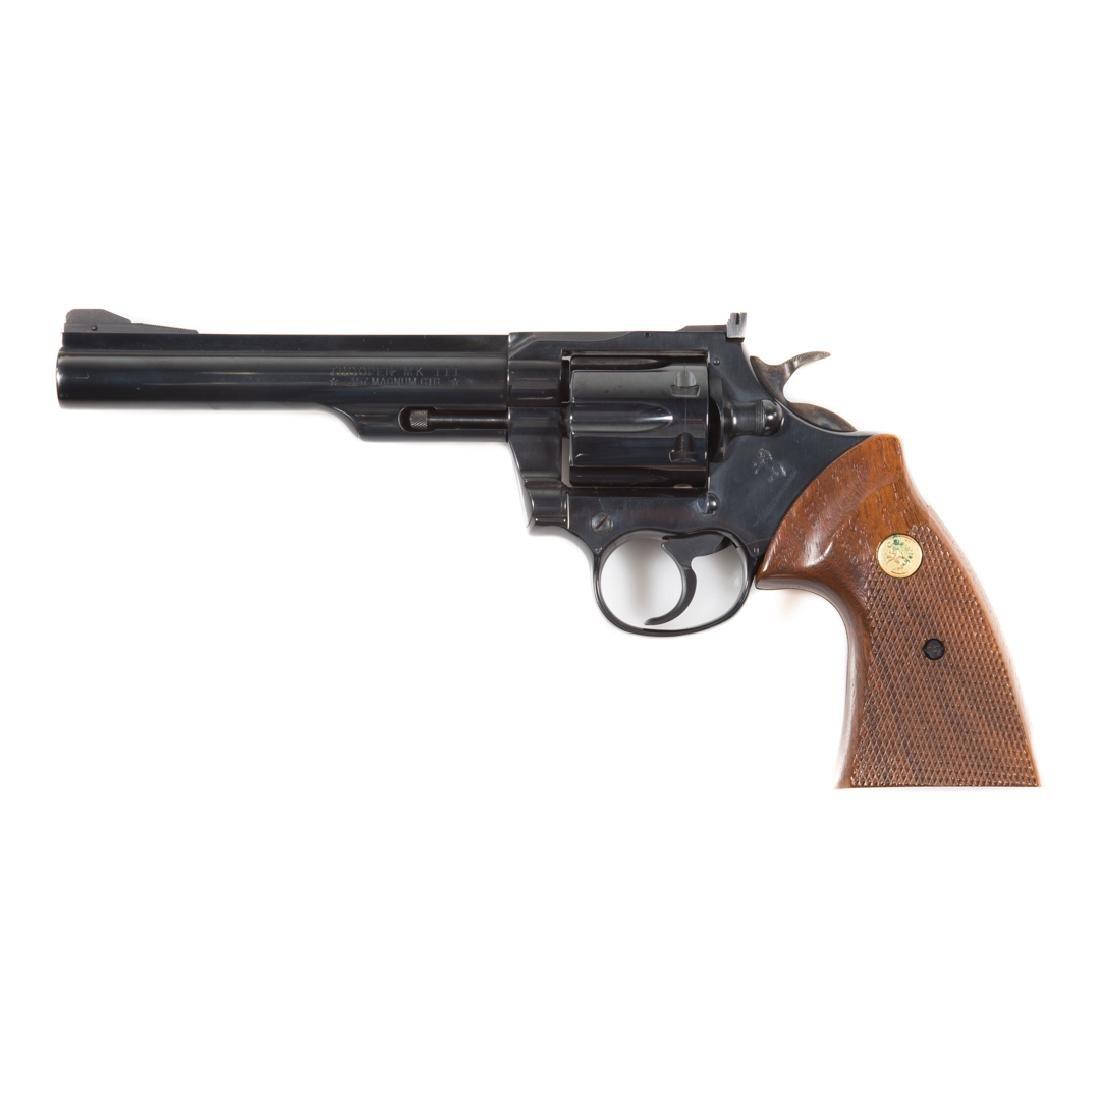 Colt Trooper MK III 357 magnum revolver - 3